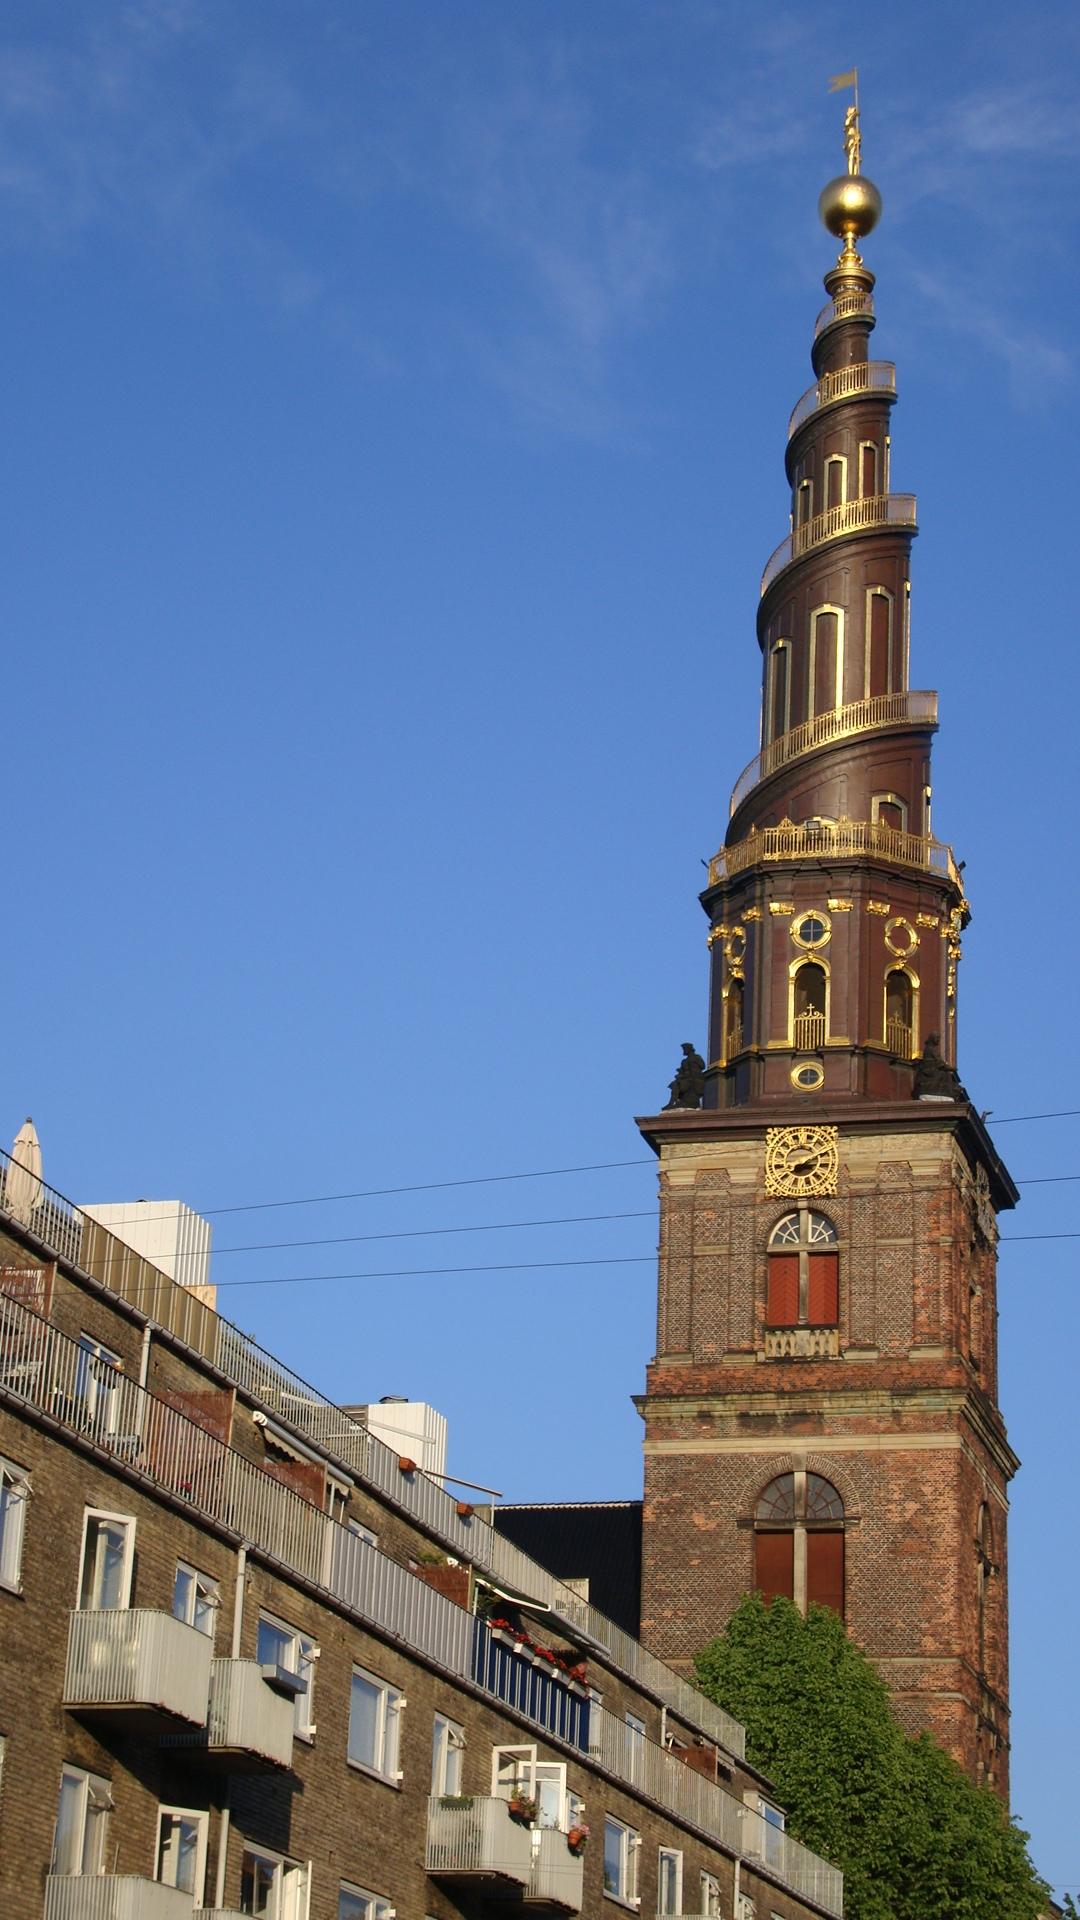 Evangélico brasileiros se organizam e promovem culto na Dinamarca